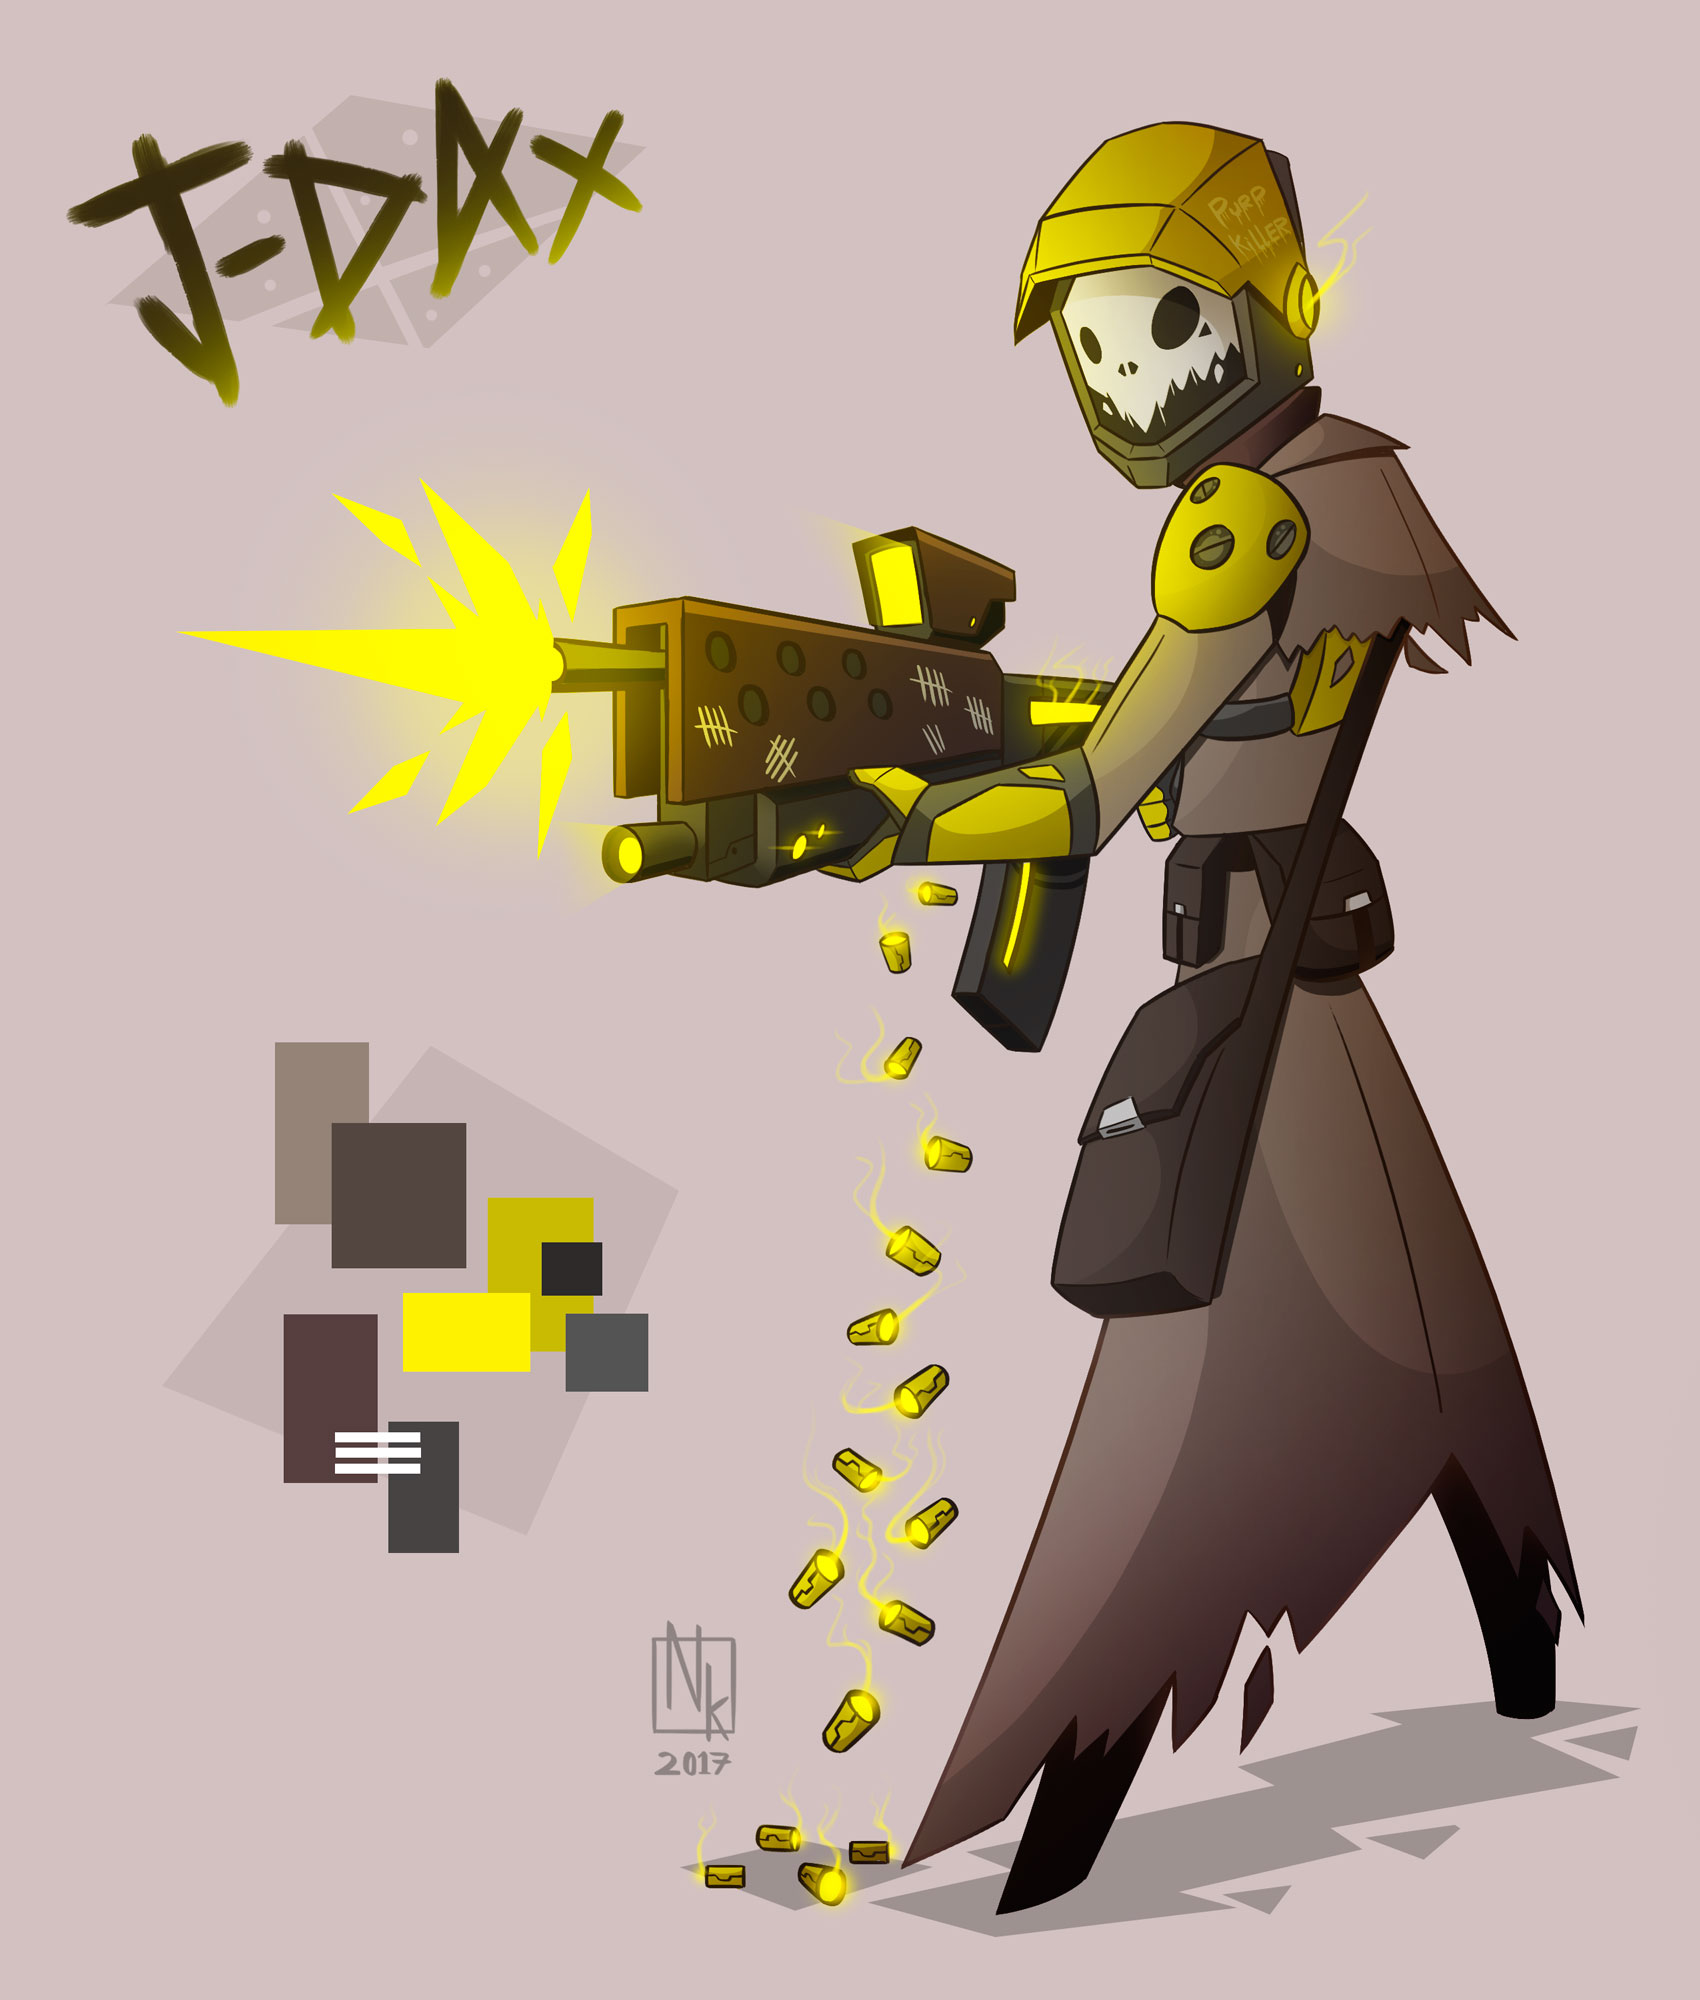 Webcomic character #5: J-Dax